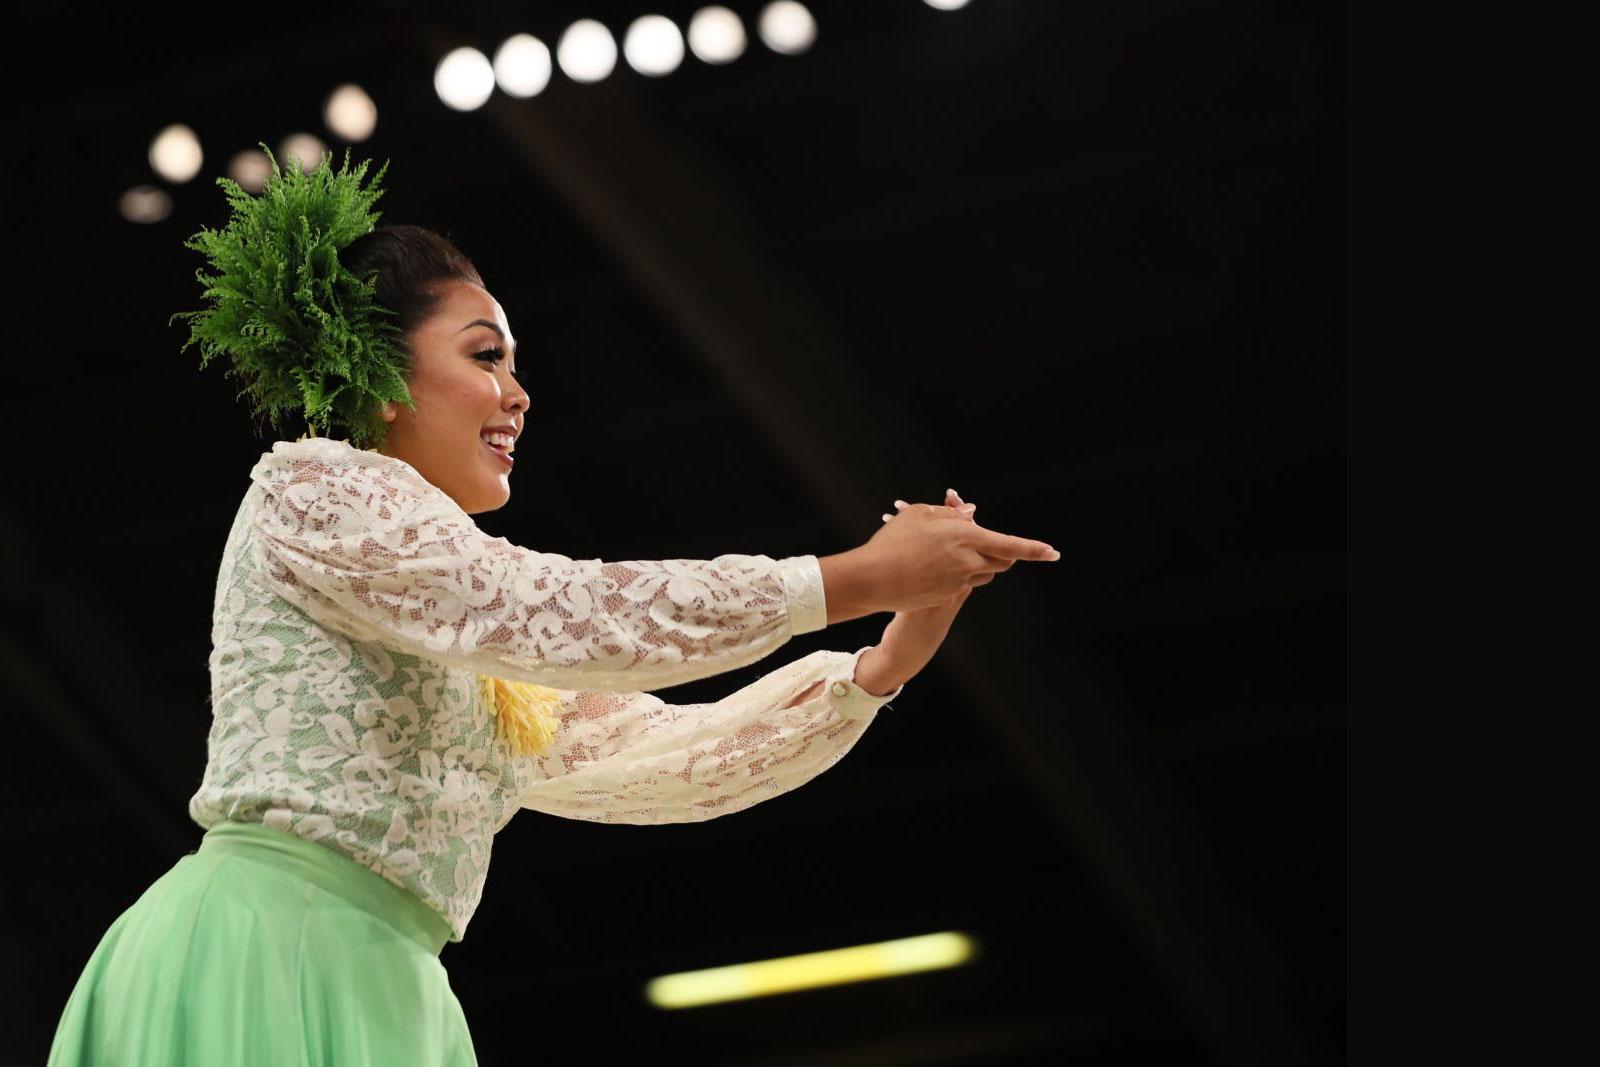 Merrie Monarch Festival–Miss Aloha Hula 2017